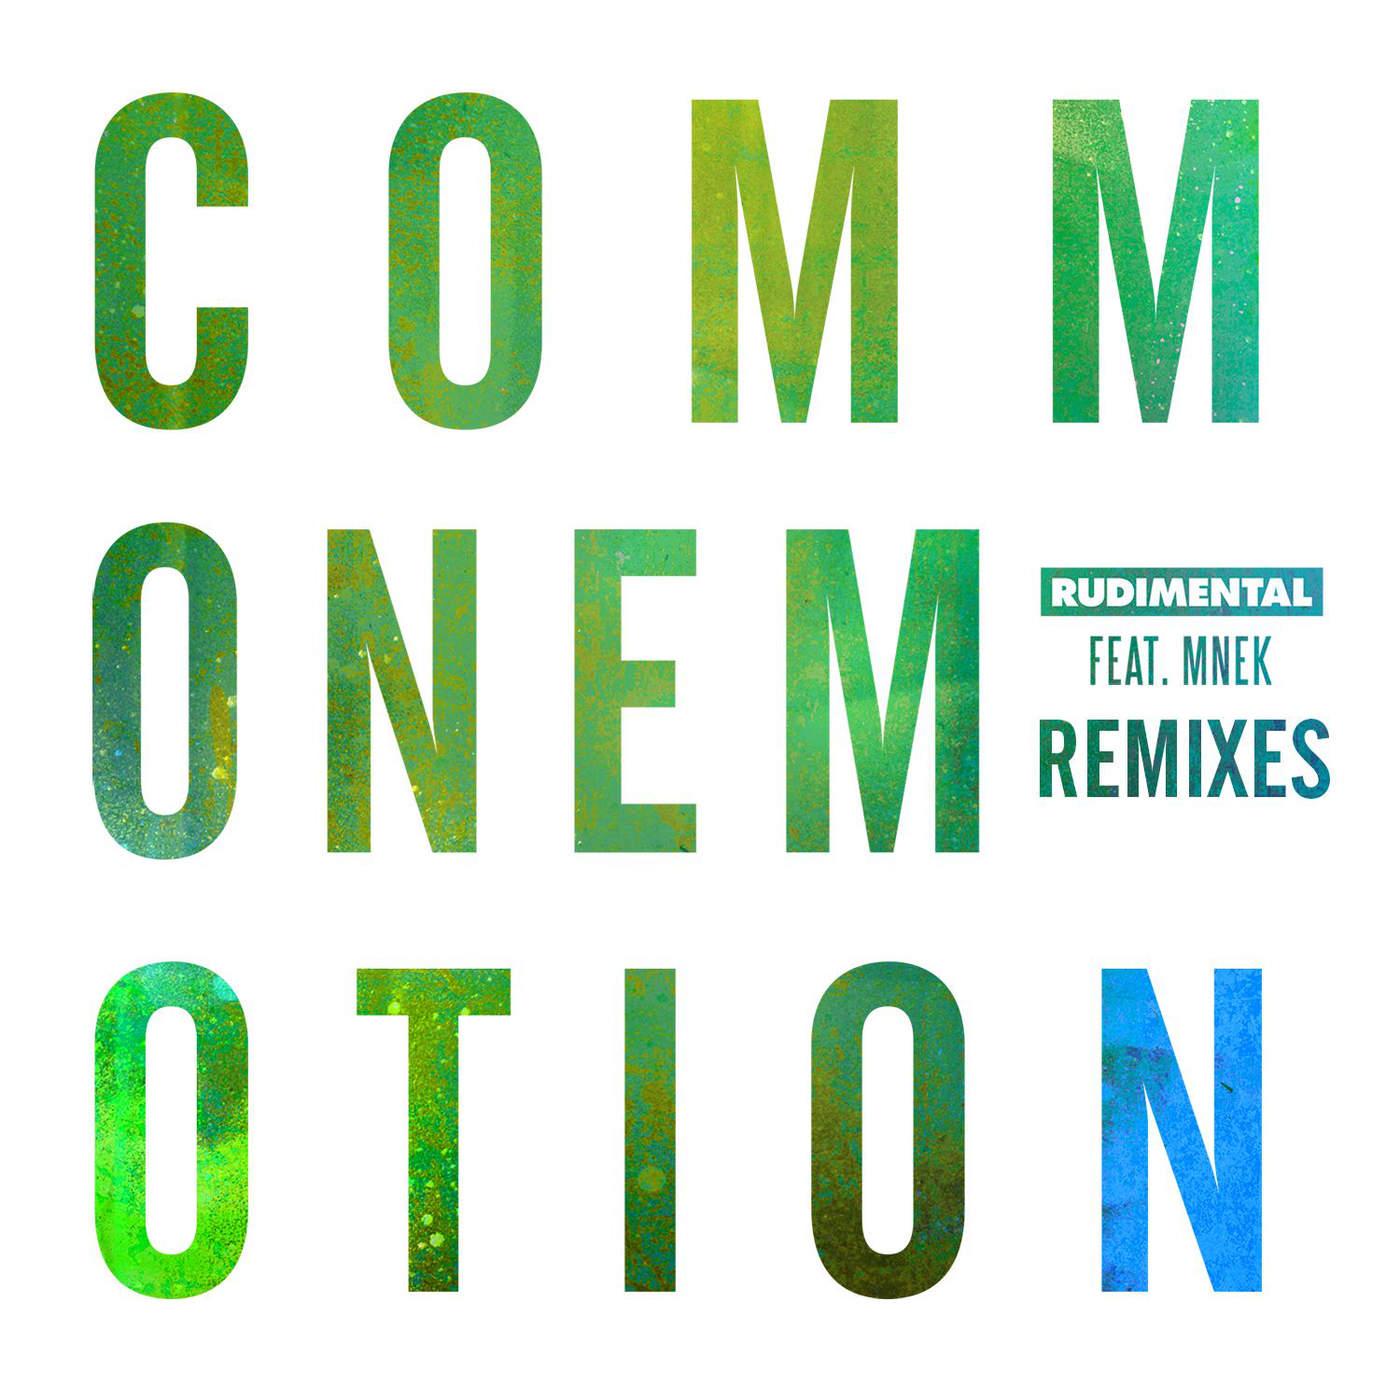 Rudimental - Common Emotion (feat. MNEK) [Remixes] - Single Cover